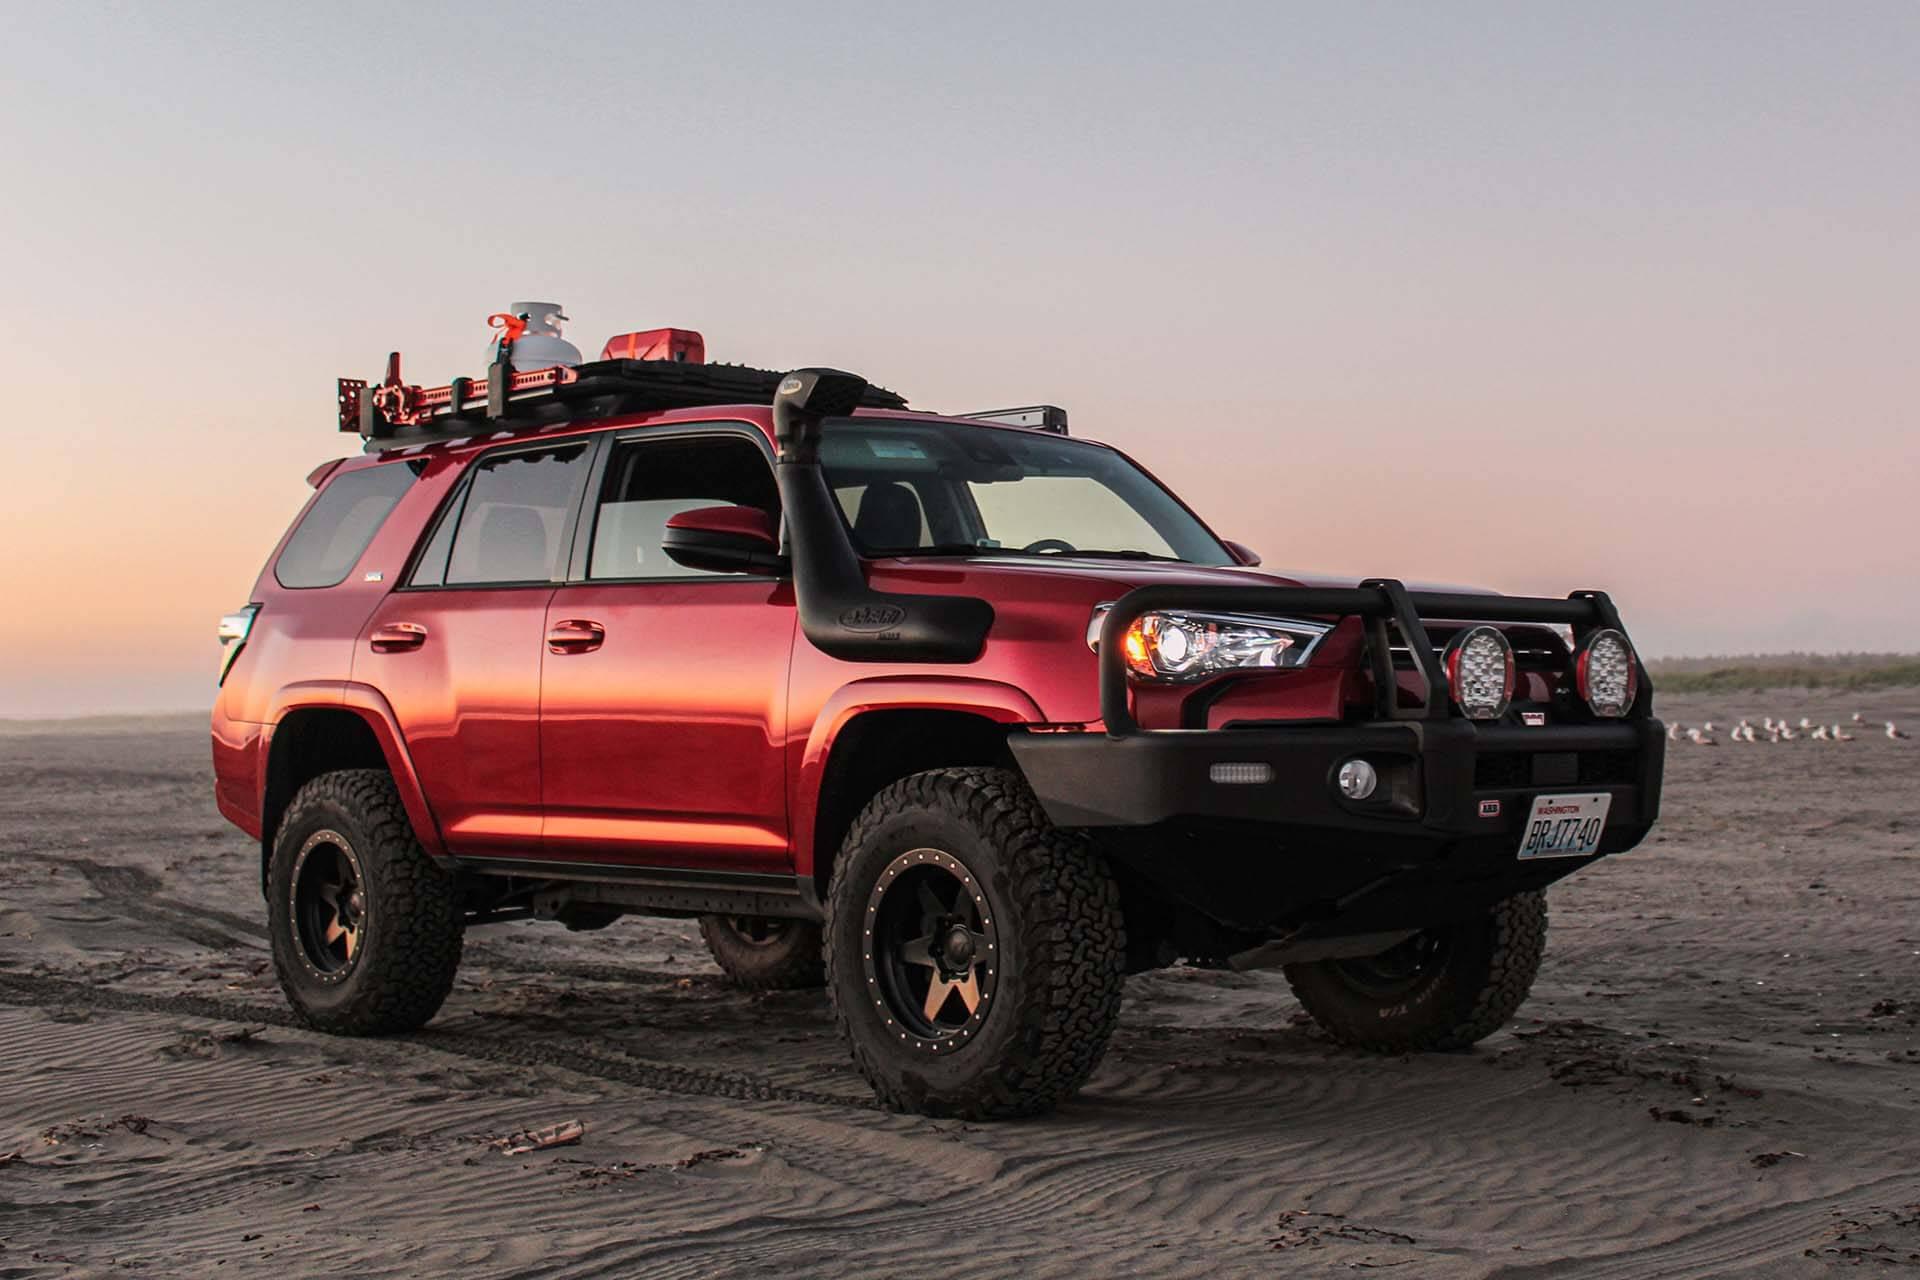 Toyota 4Runner at the beach